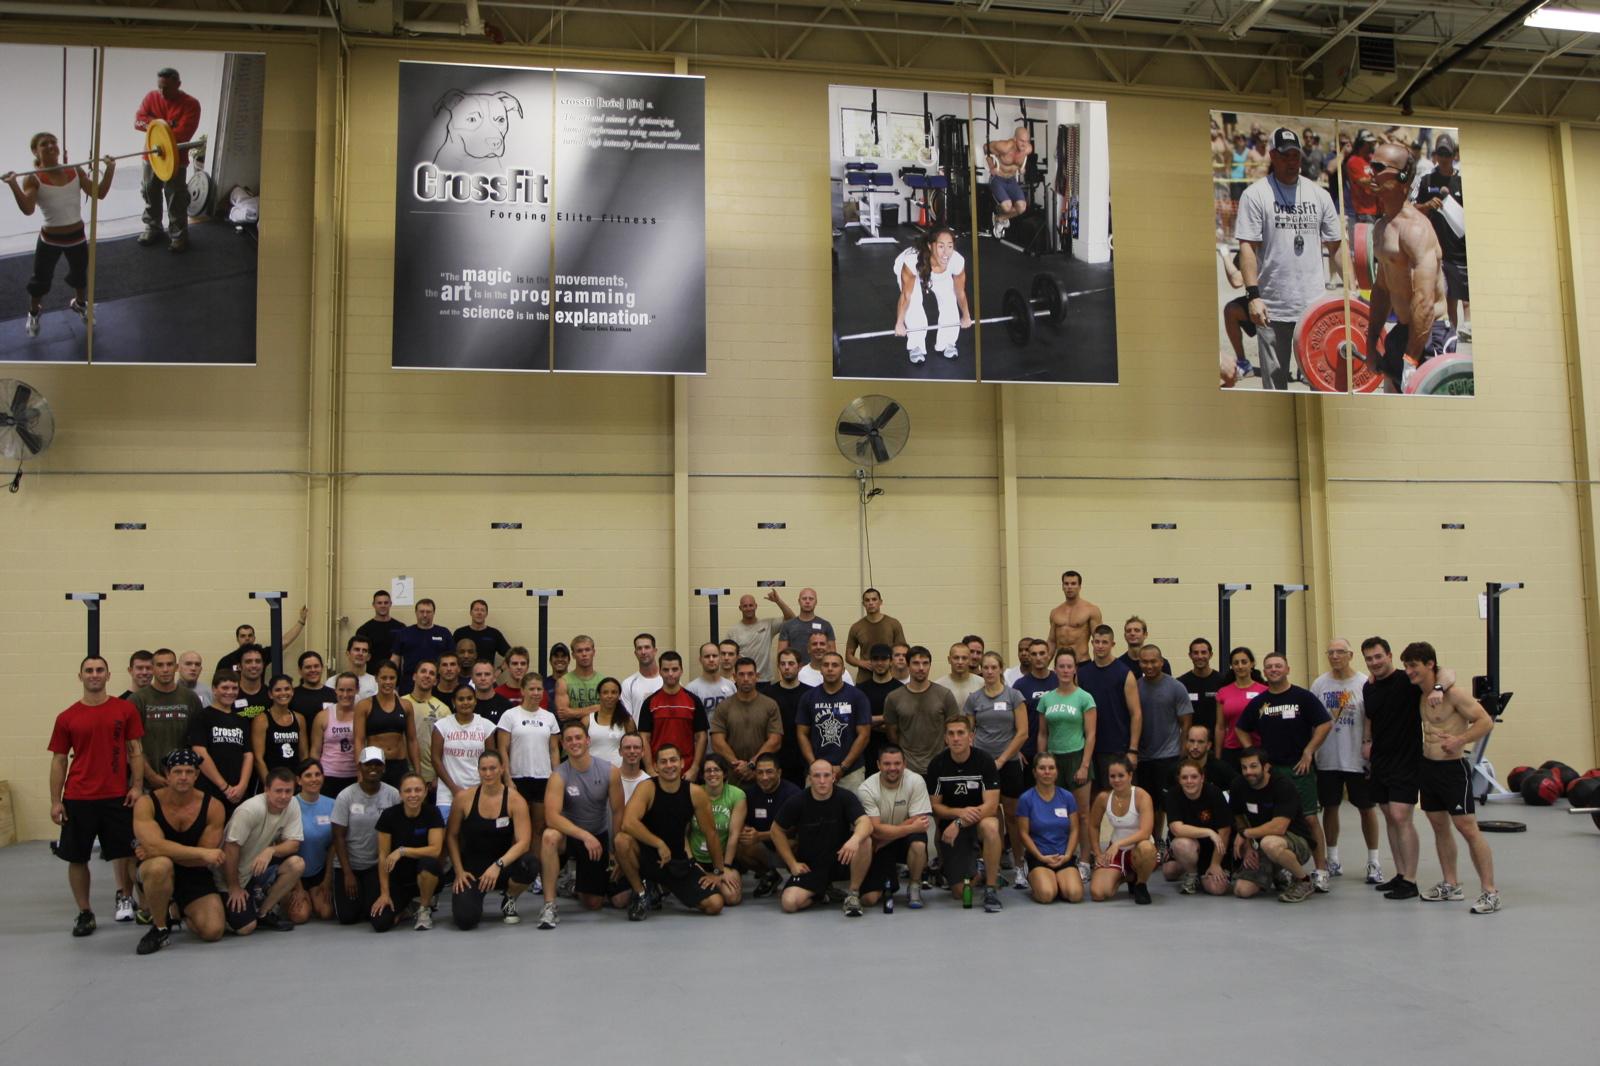 Crossfit forging elite fitness monday 080825 crossfit certification seminar crossfit training center blauer tactical xflitez Images